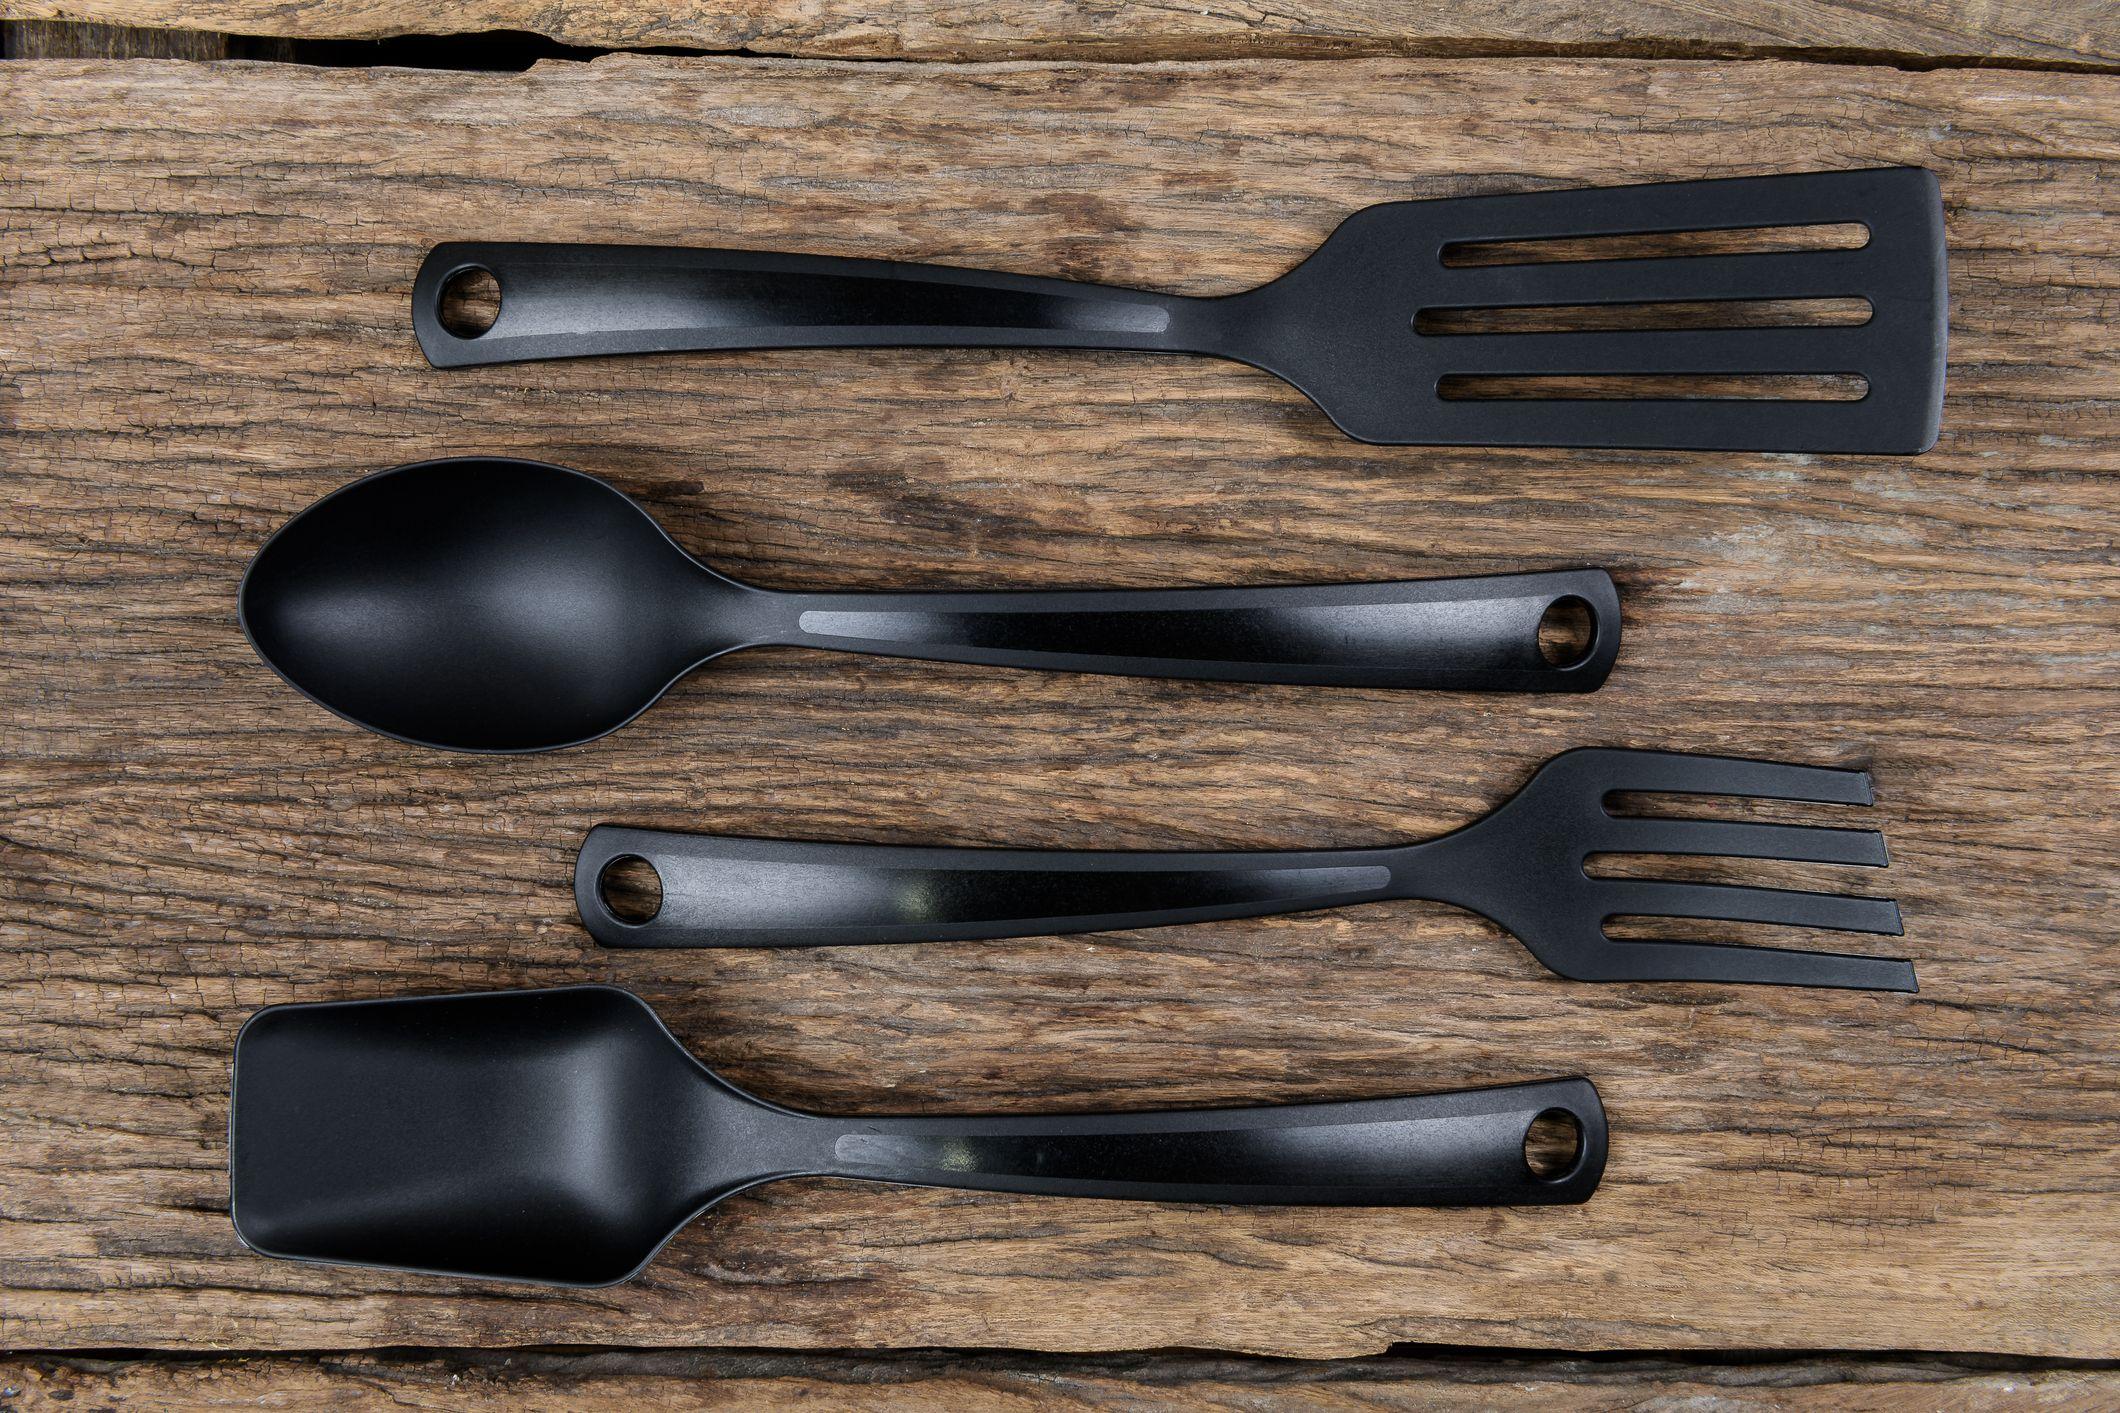 black plastic kitchen set skimmer, spade of frying pan on wooden